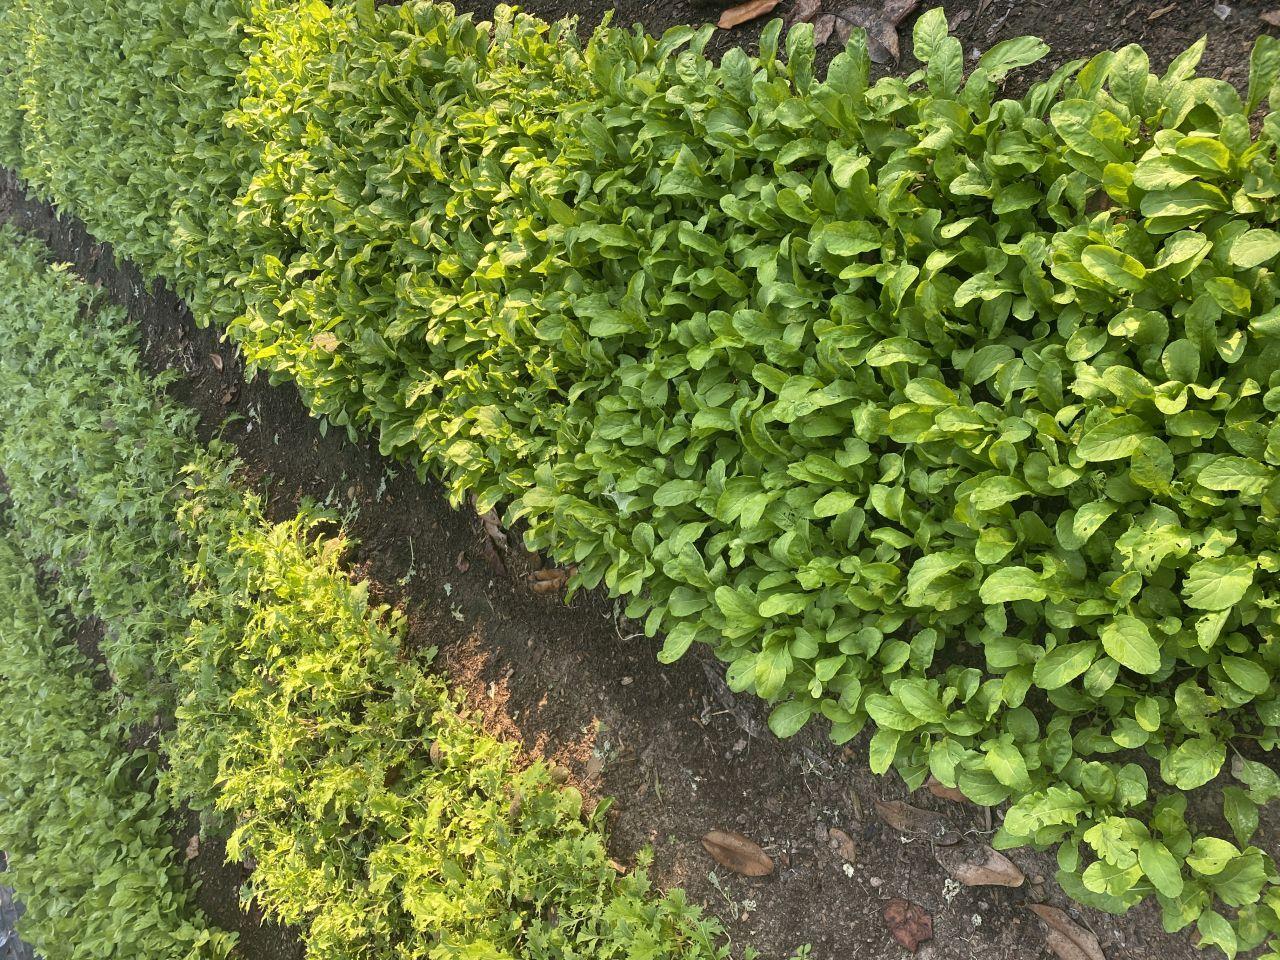 Rows of freshly hoed winter greens pop through the soil at Birdeye Farms